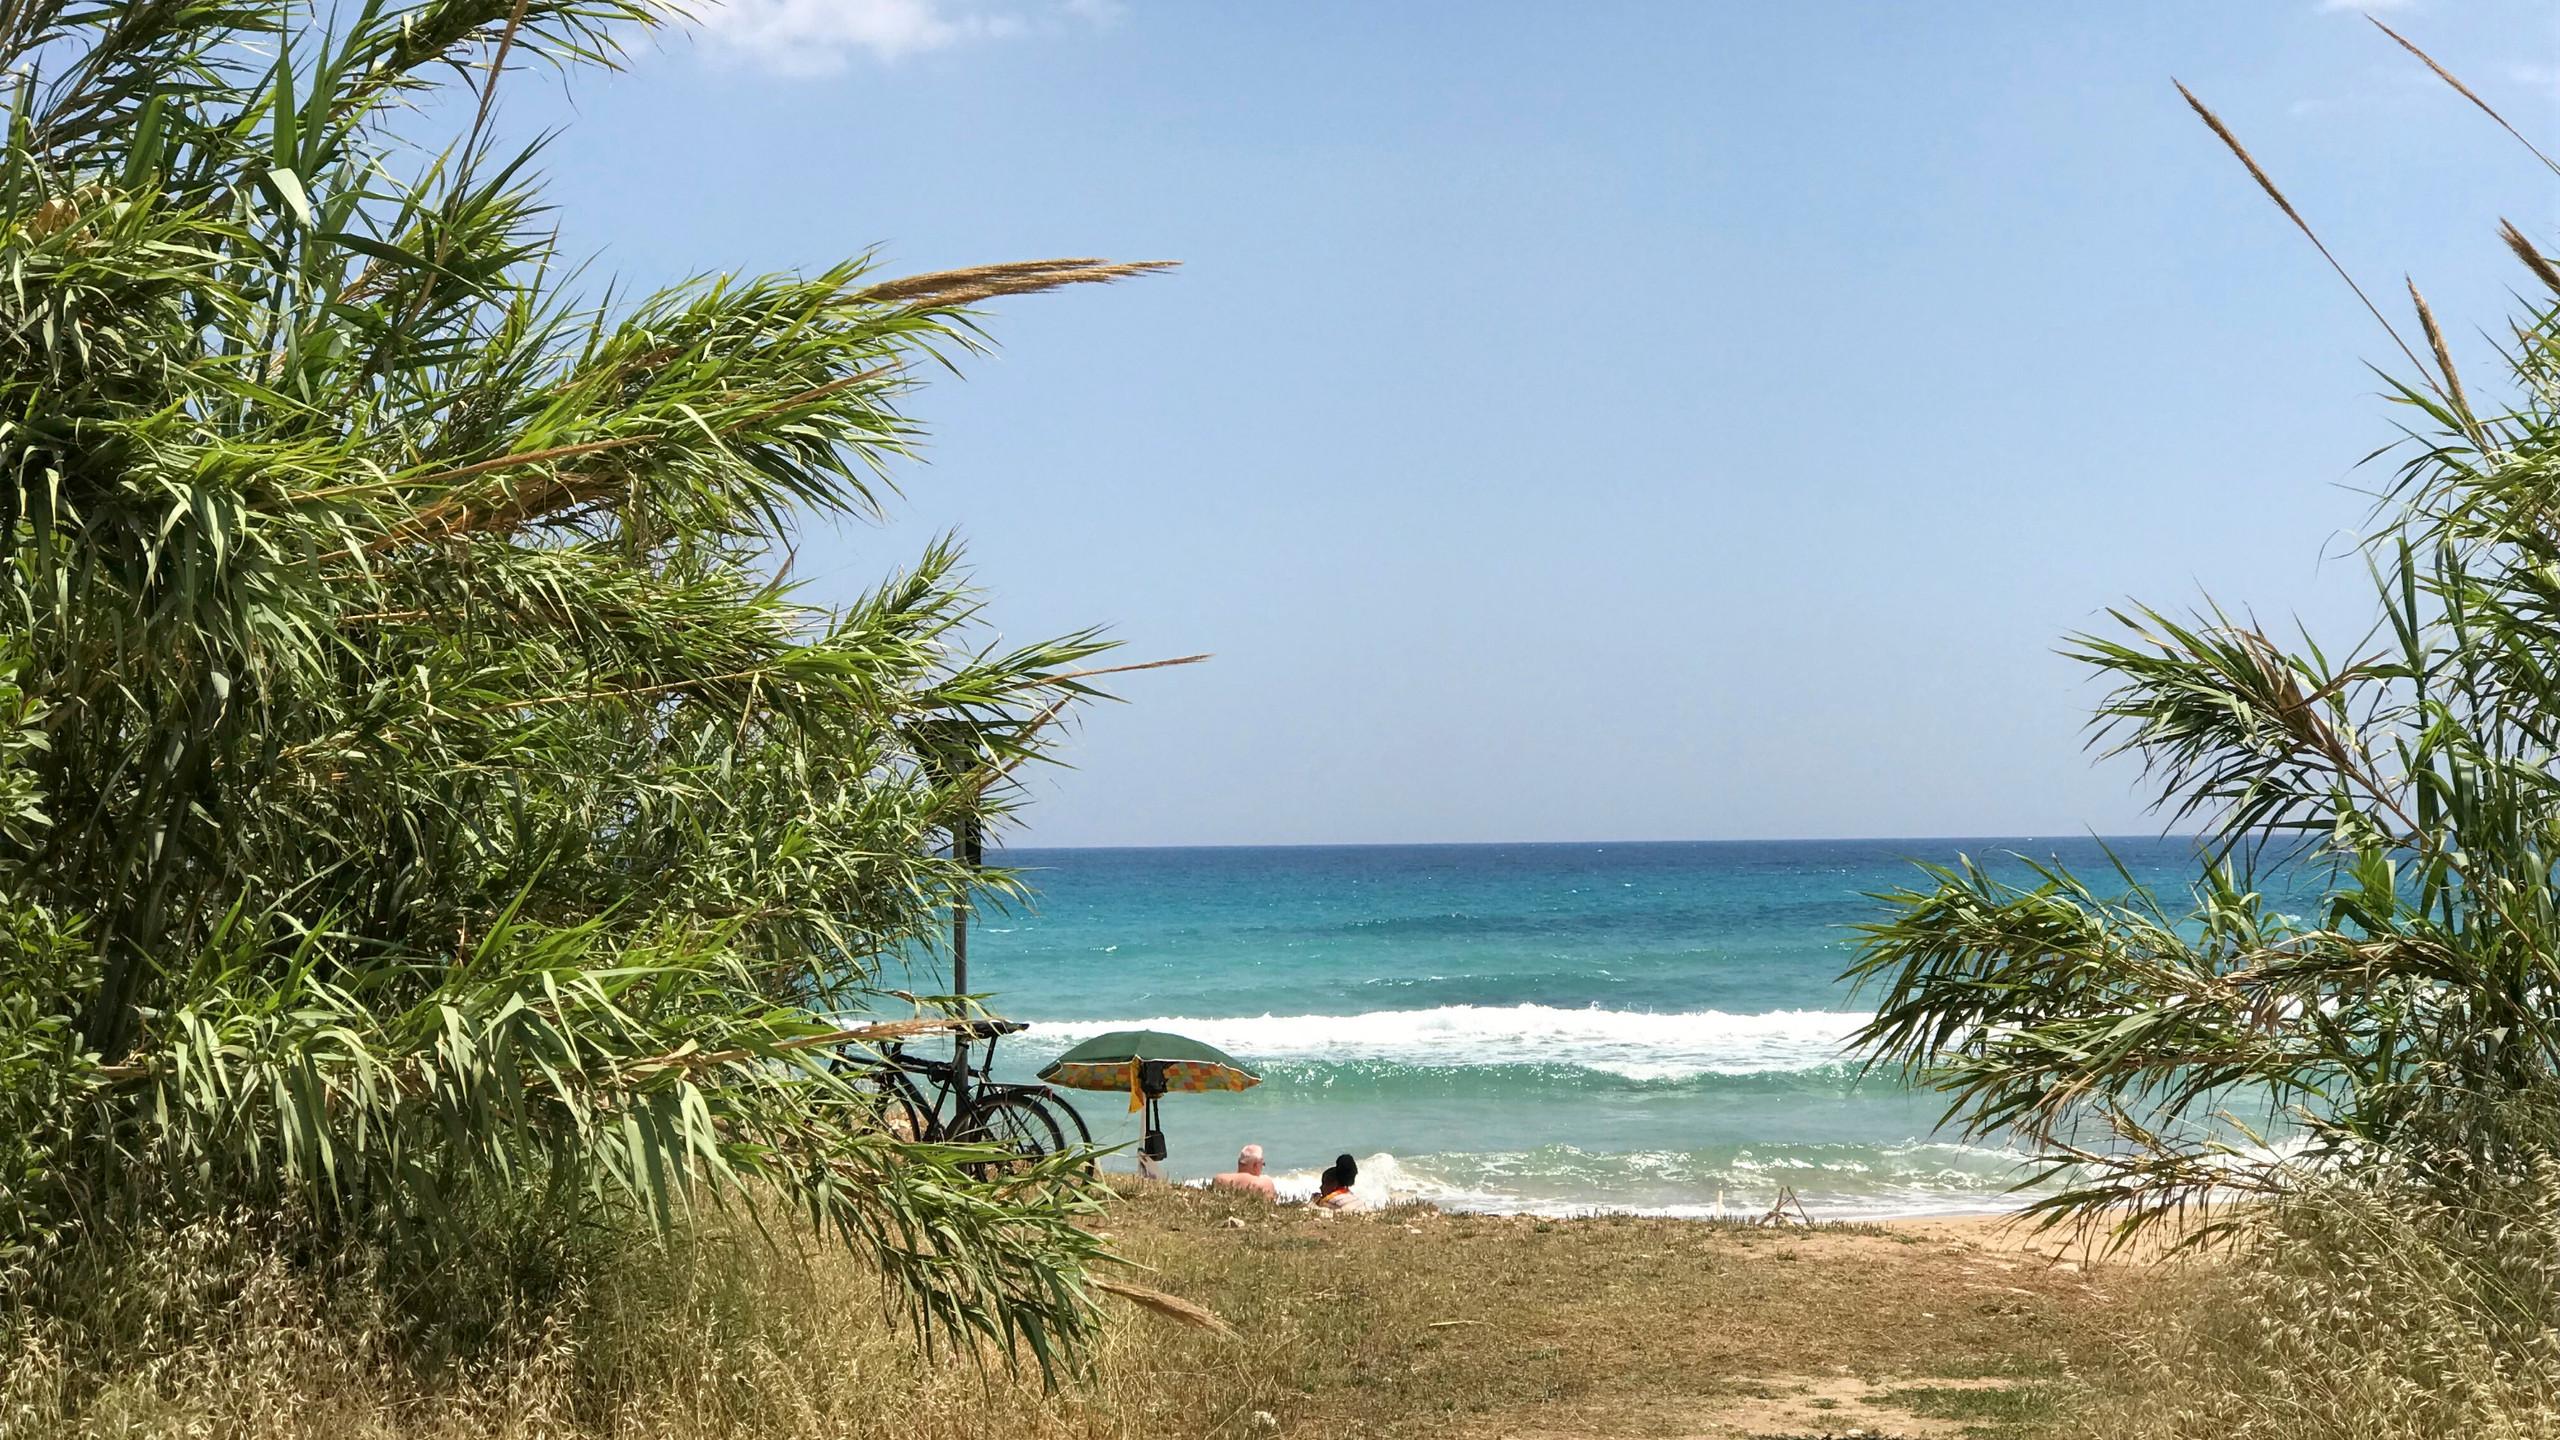 Marchesa di Cassibile beach, лучшие пляжи Сицилии